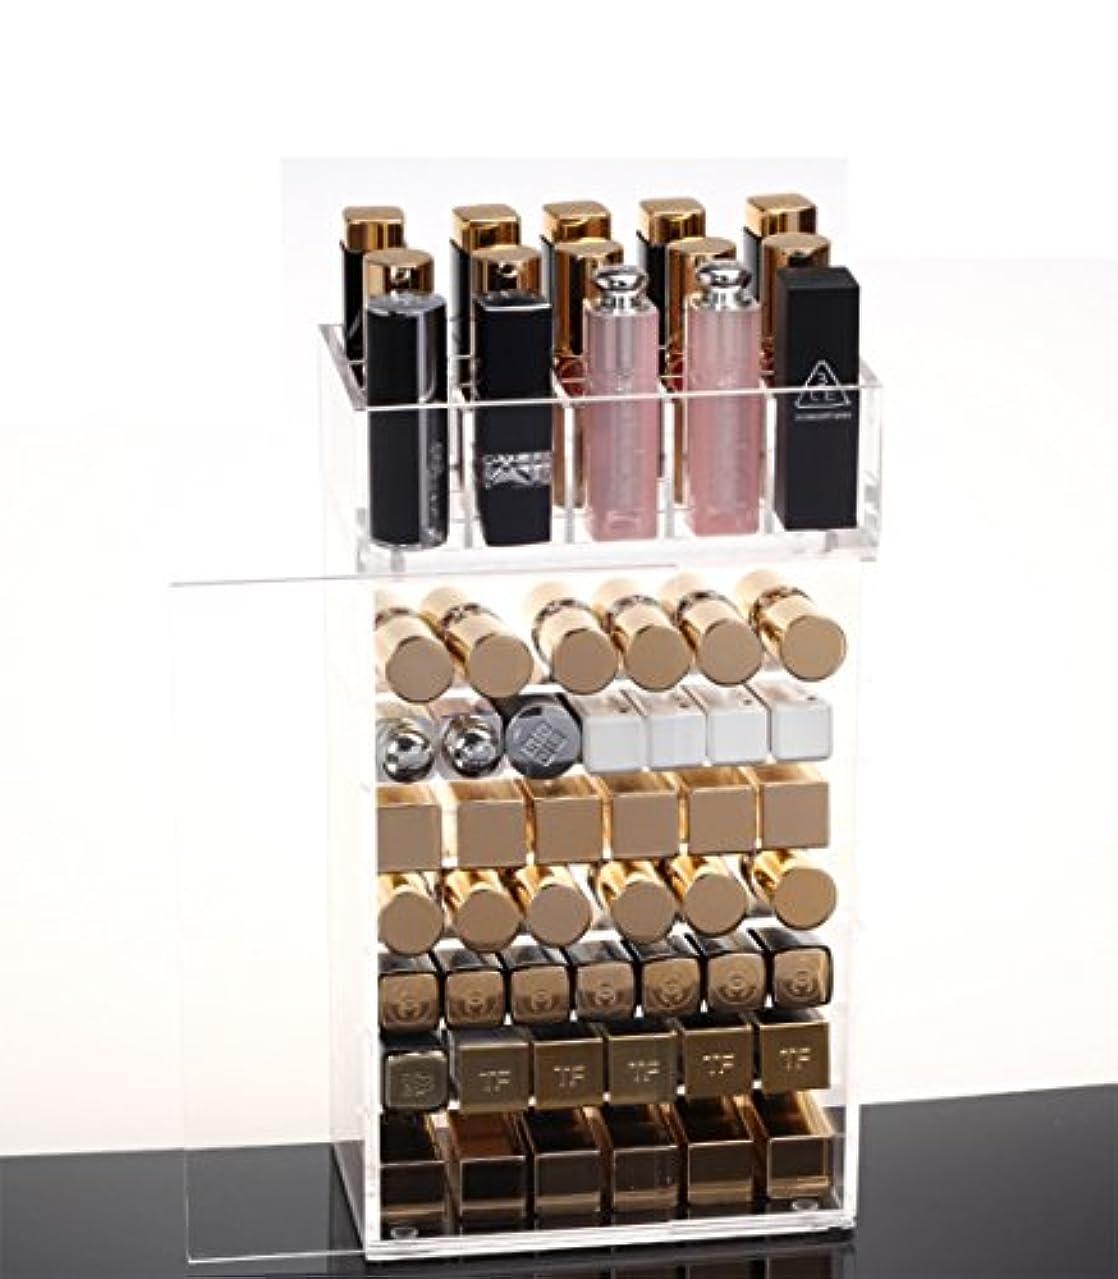 SZTulip 化粧品収納ボックス メイクケース メイクボックス 口紅収納 ネイルカラー小物入れ レディース  透明アクリル 防塵ドア付き コスメボックス